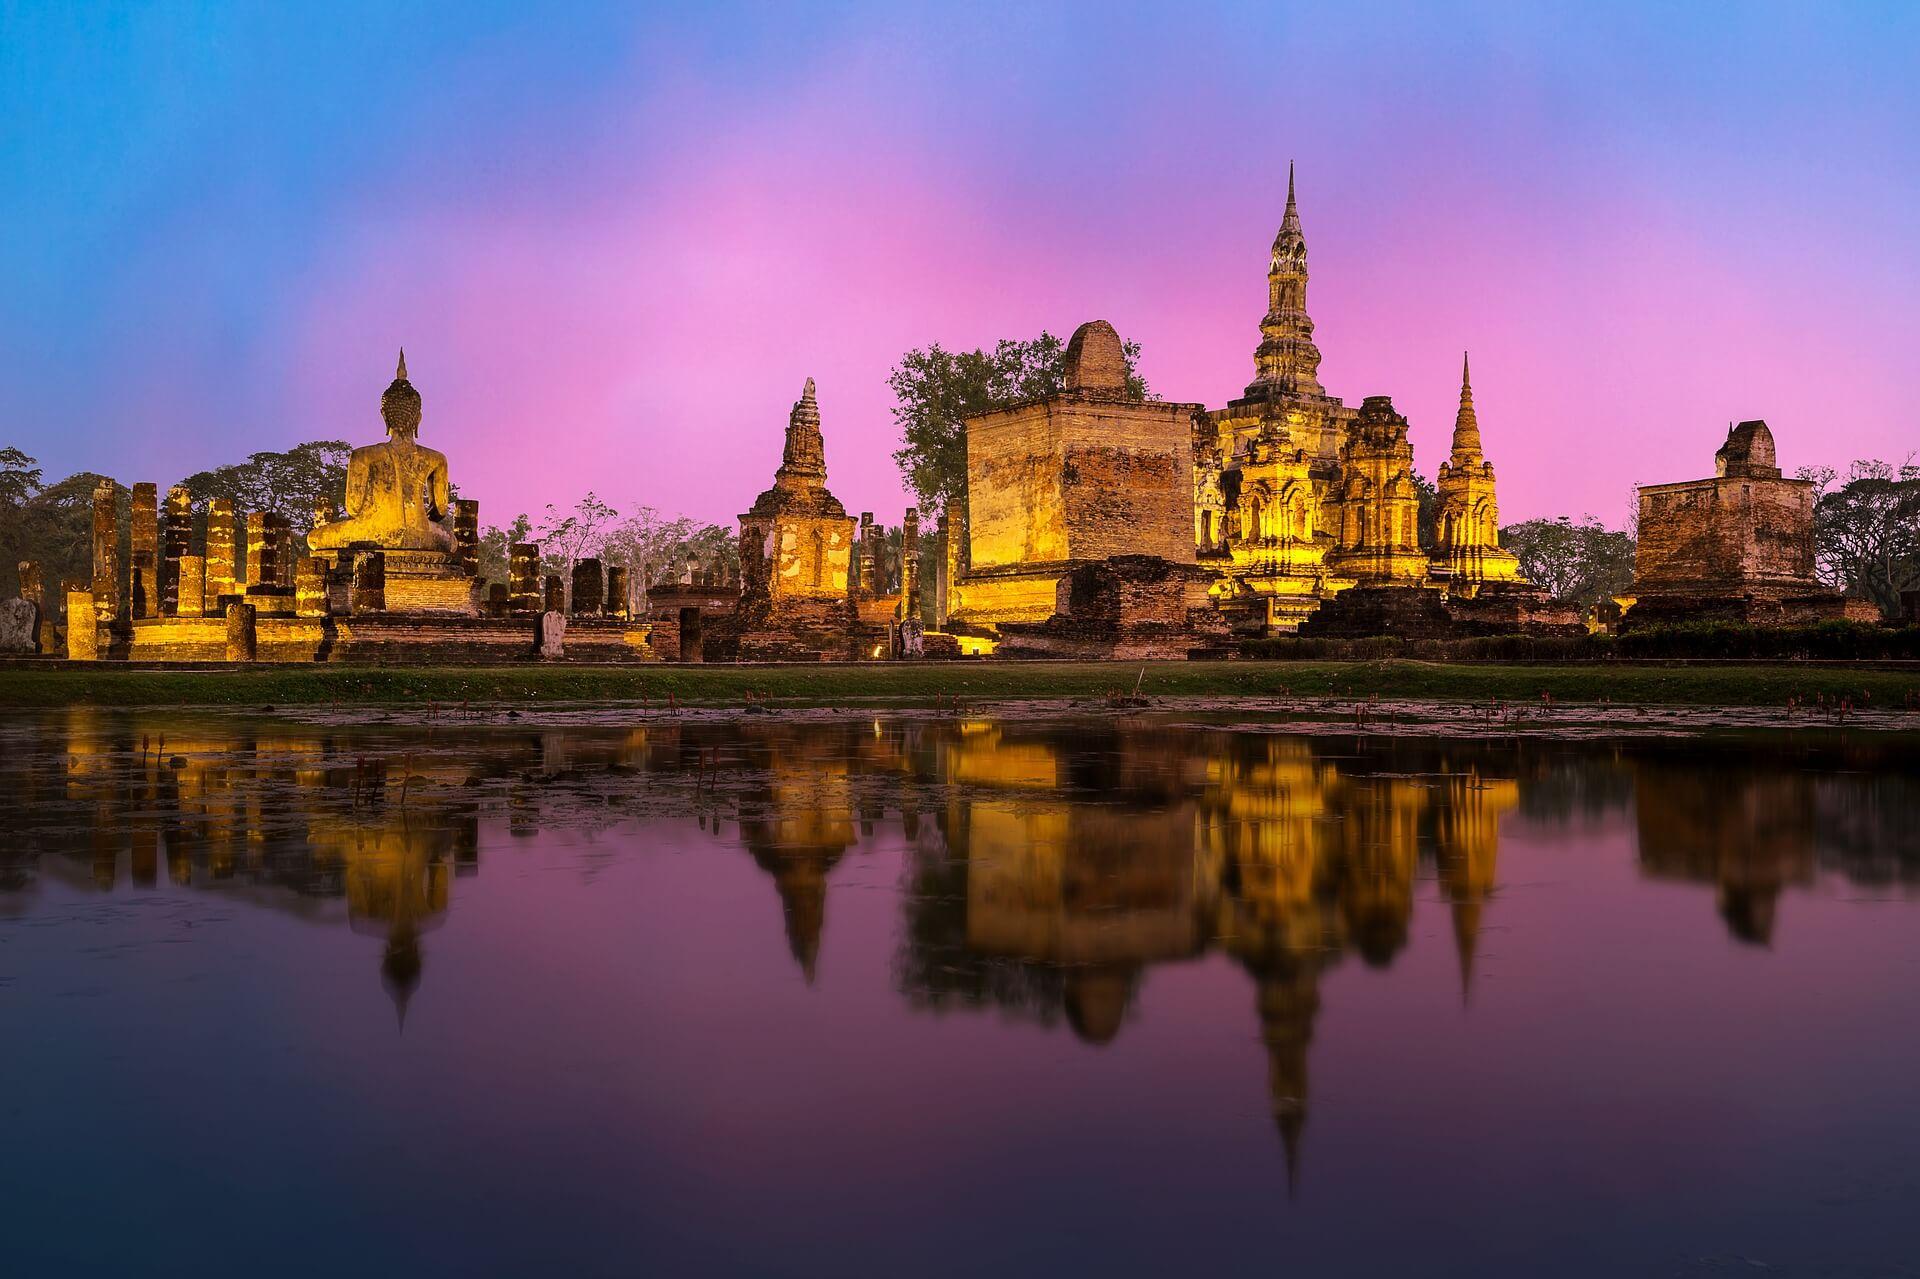 Direktflüge und Billigflüge ab Köln/Bonn nach Bangkok